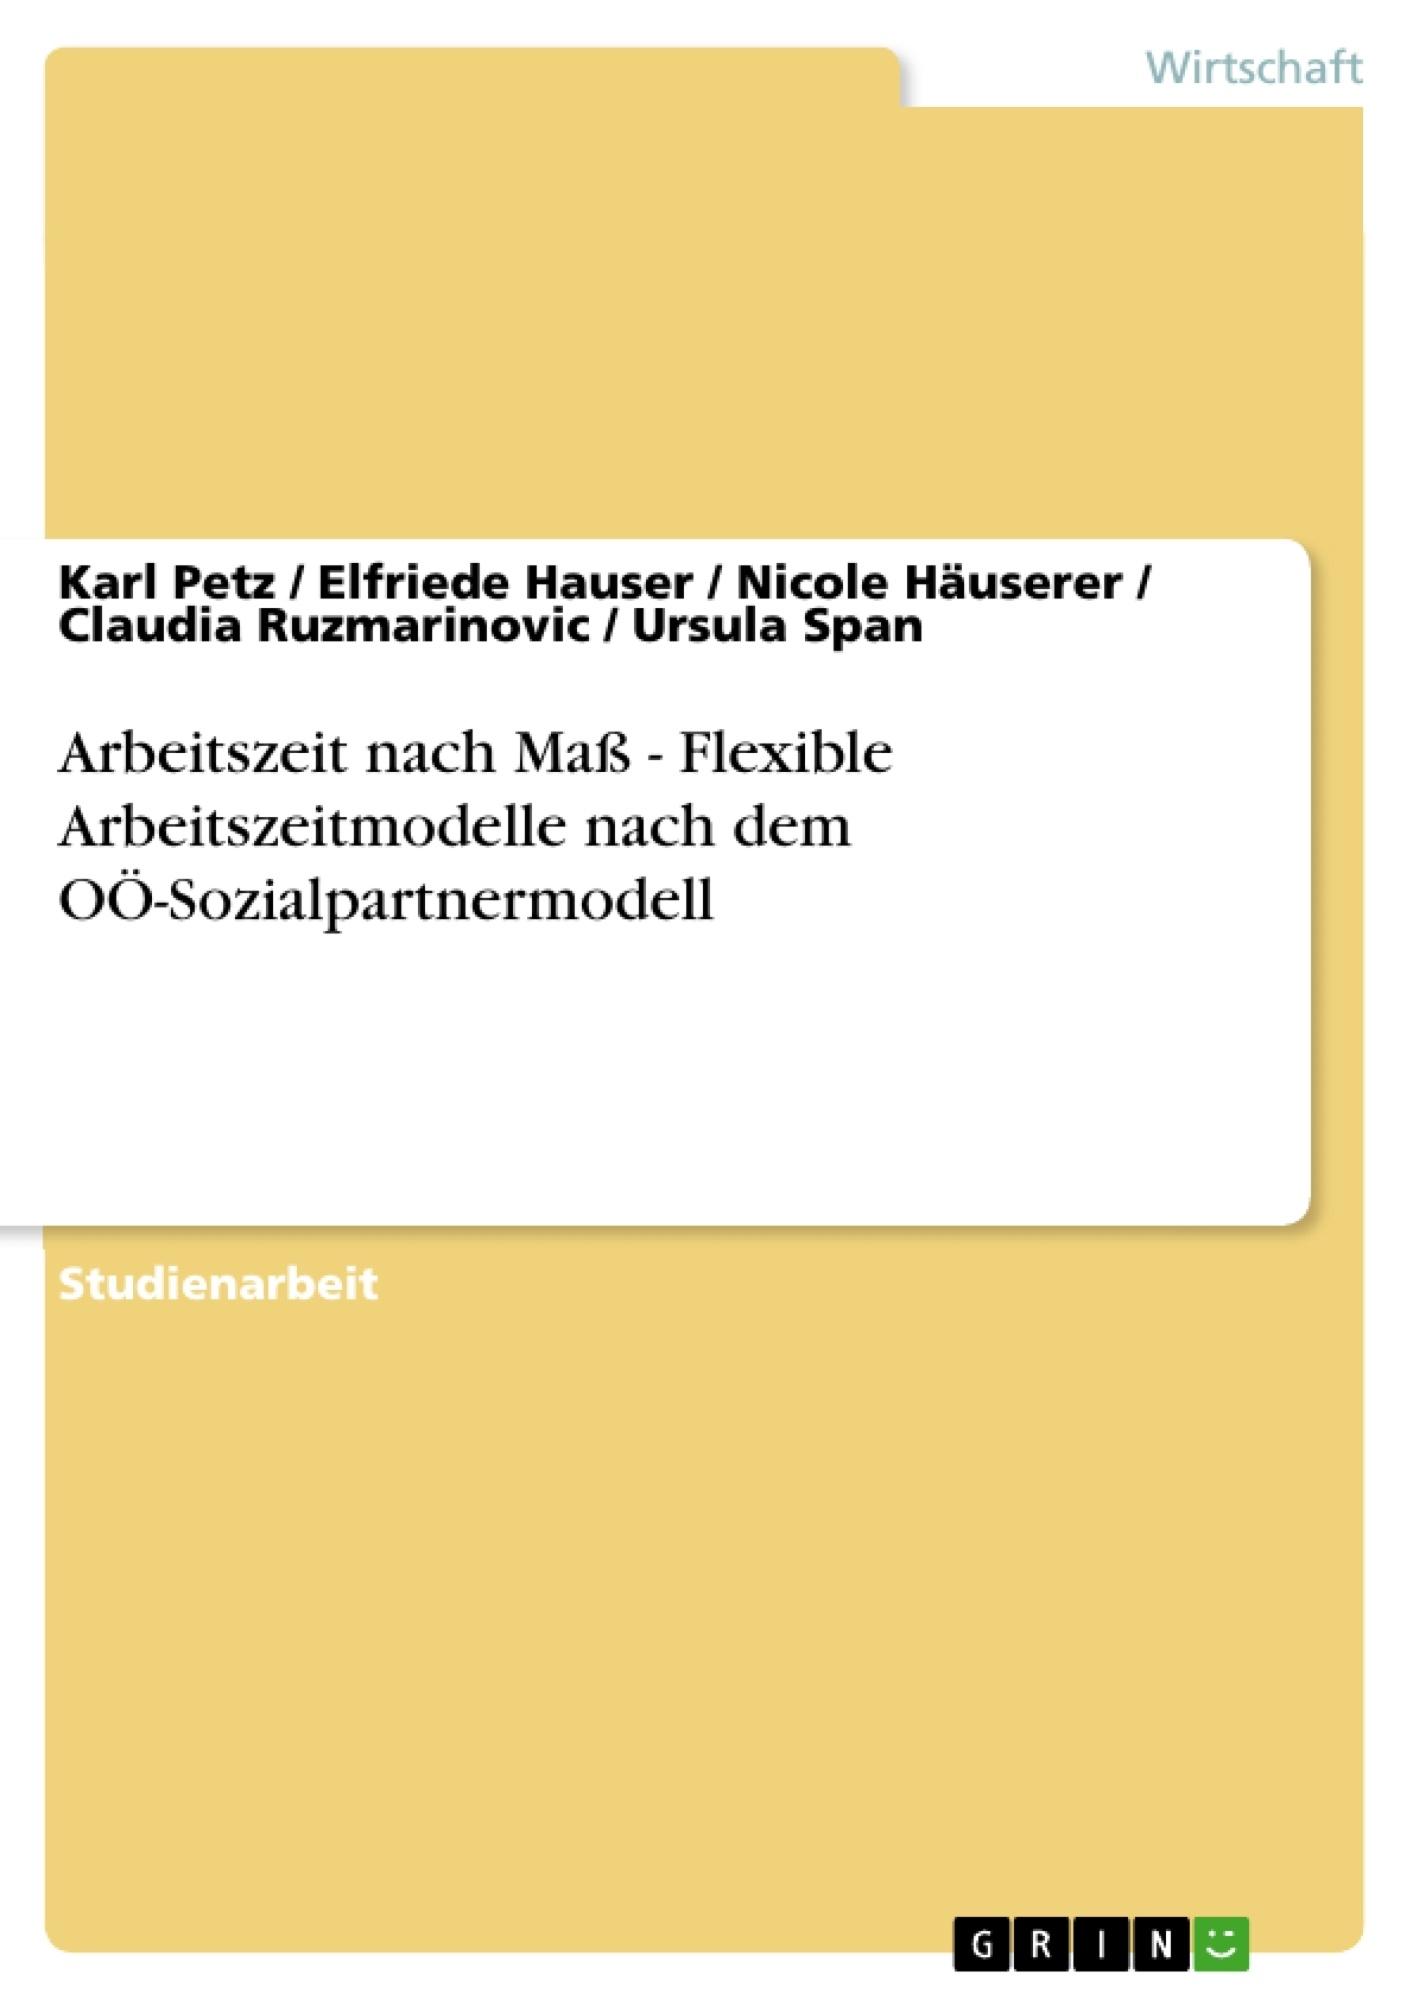 Titel: Arbeitszeit nach Maß - Flexible Arbeitszeitmodelle nach dem OÖ-Sozialpartnermodell